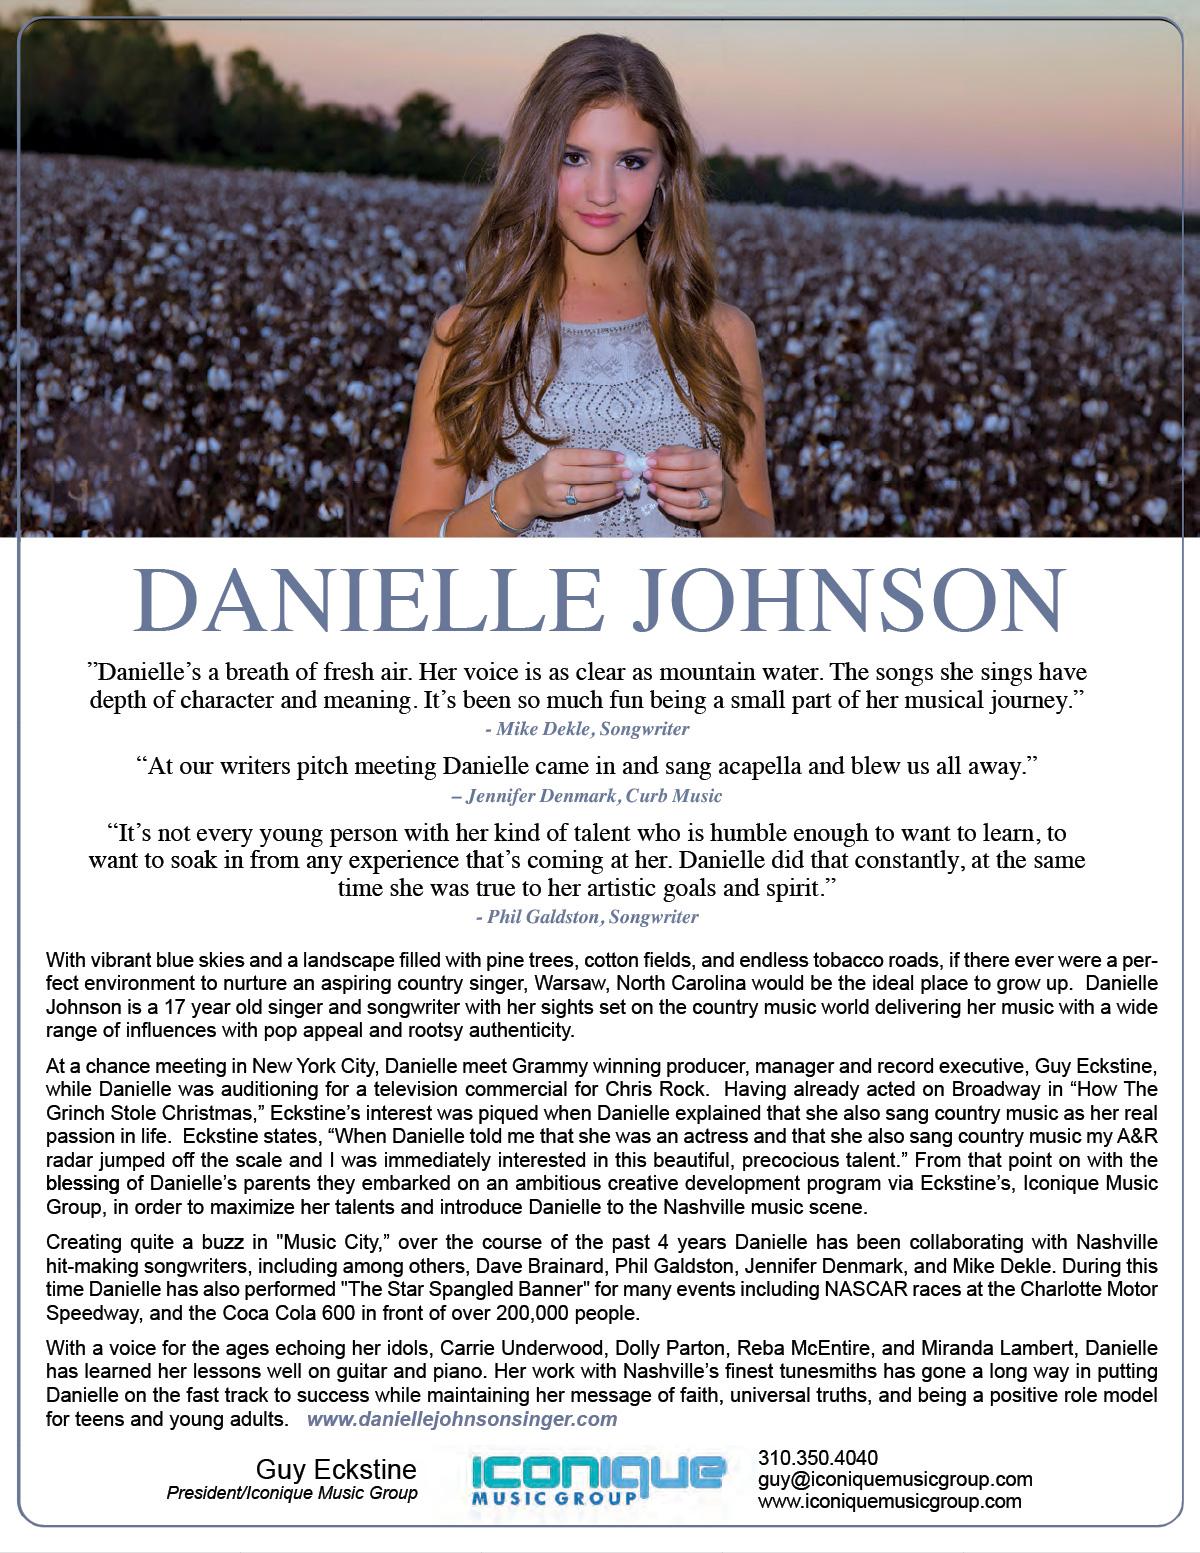 Danielle Johnson One-Sheet